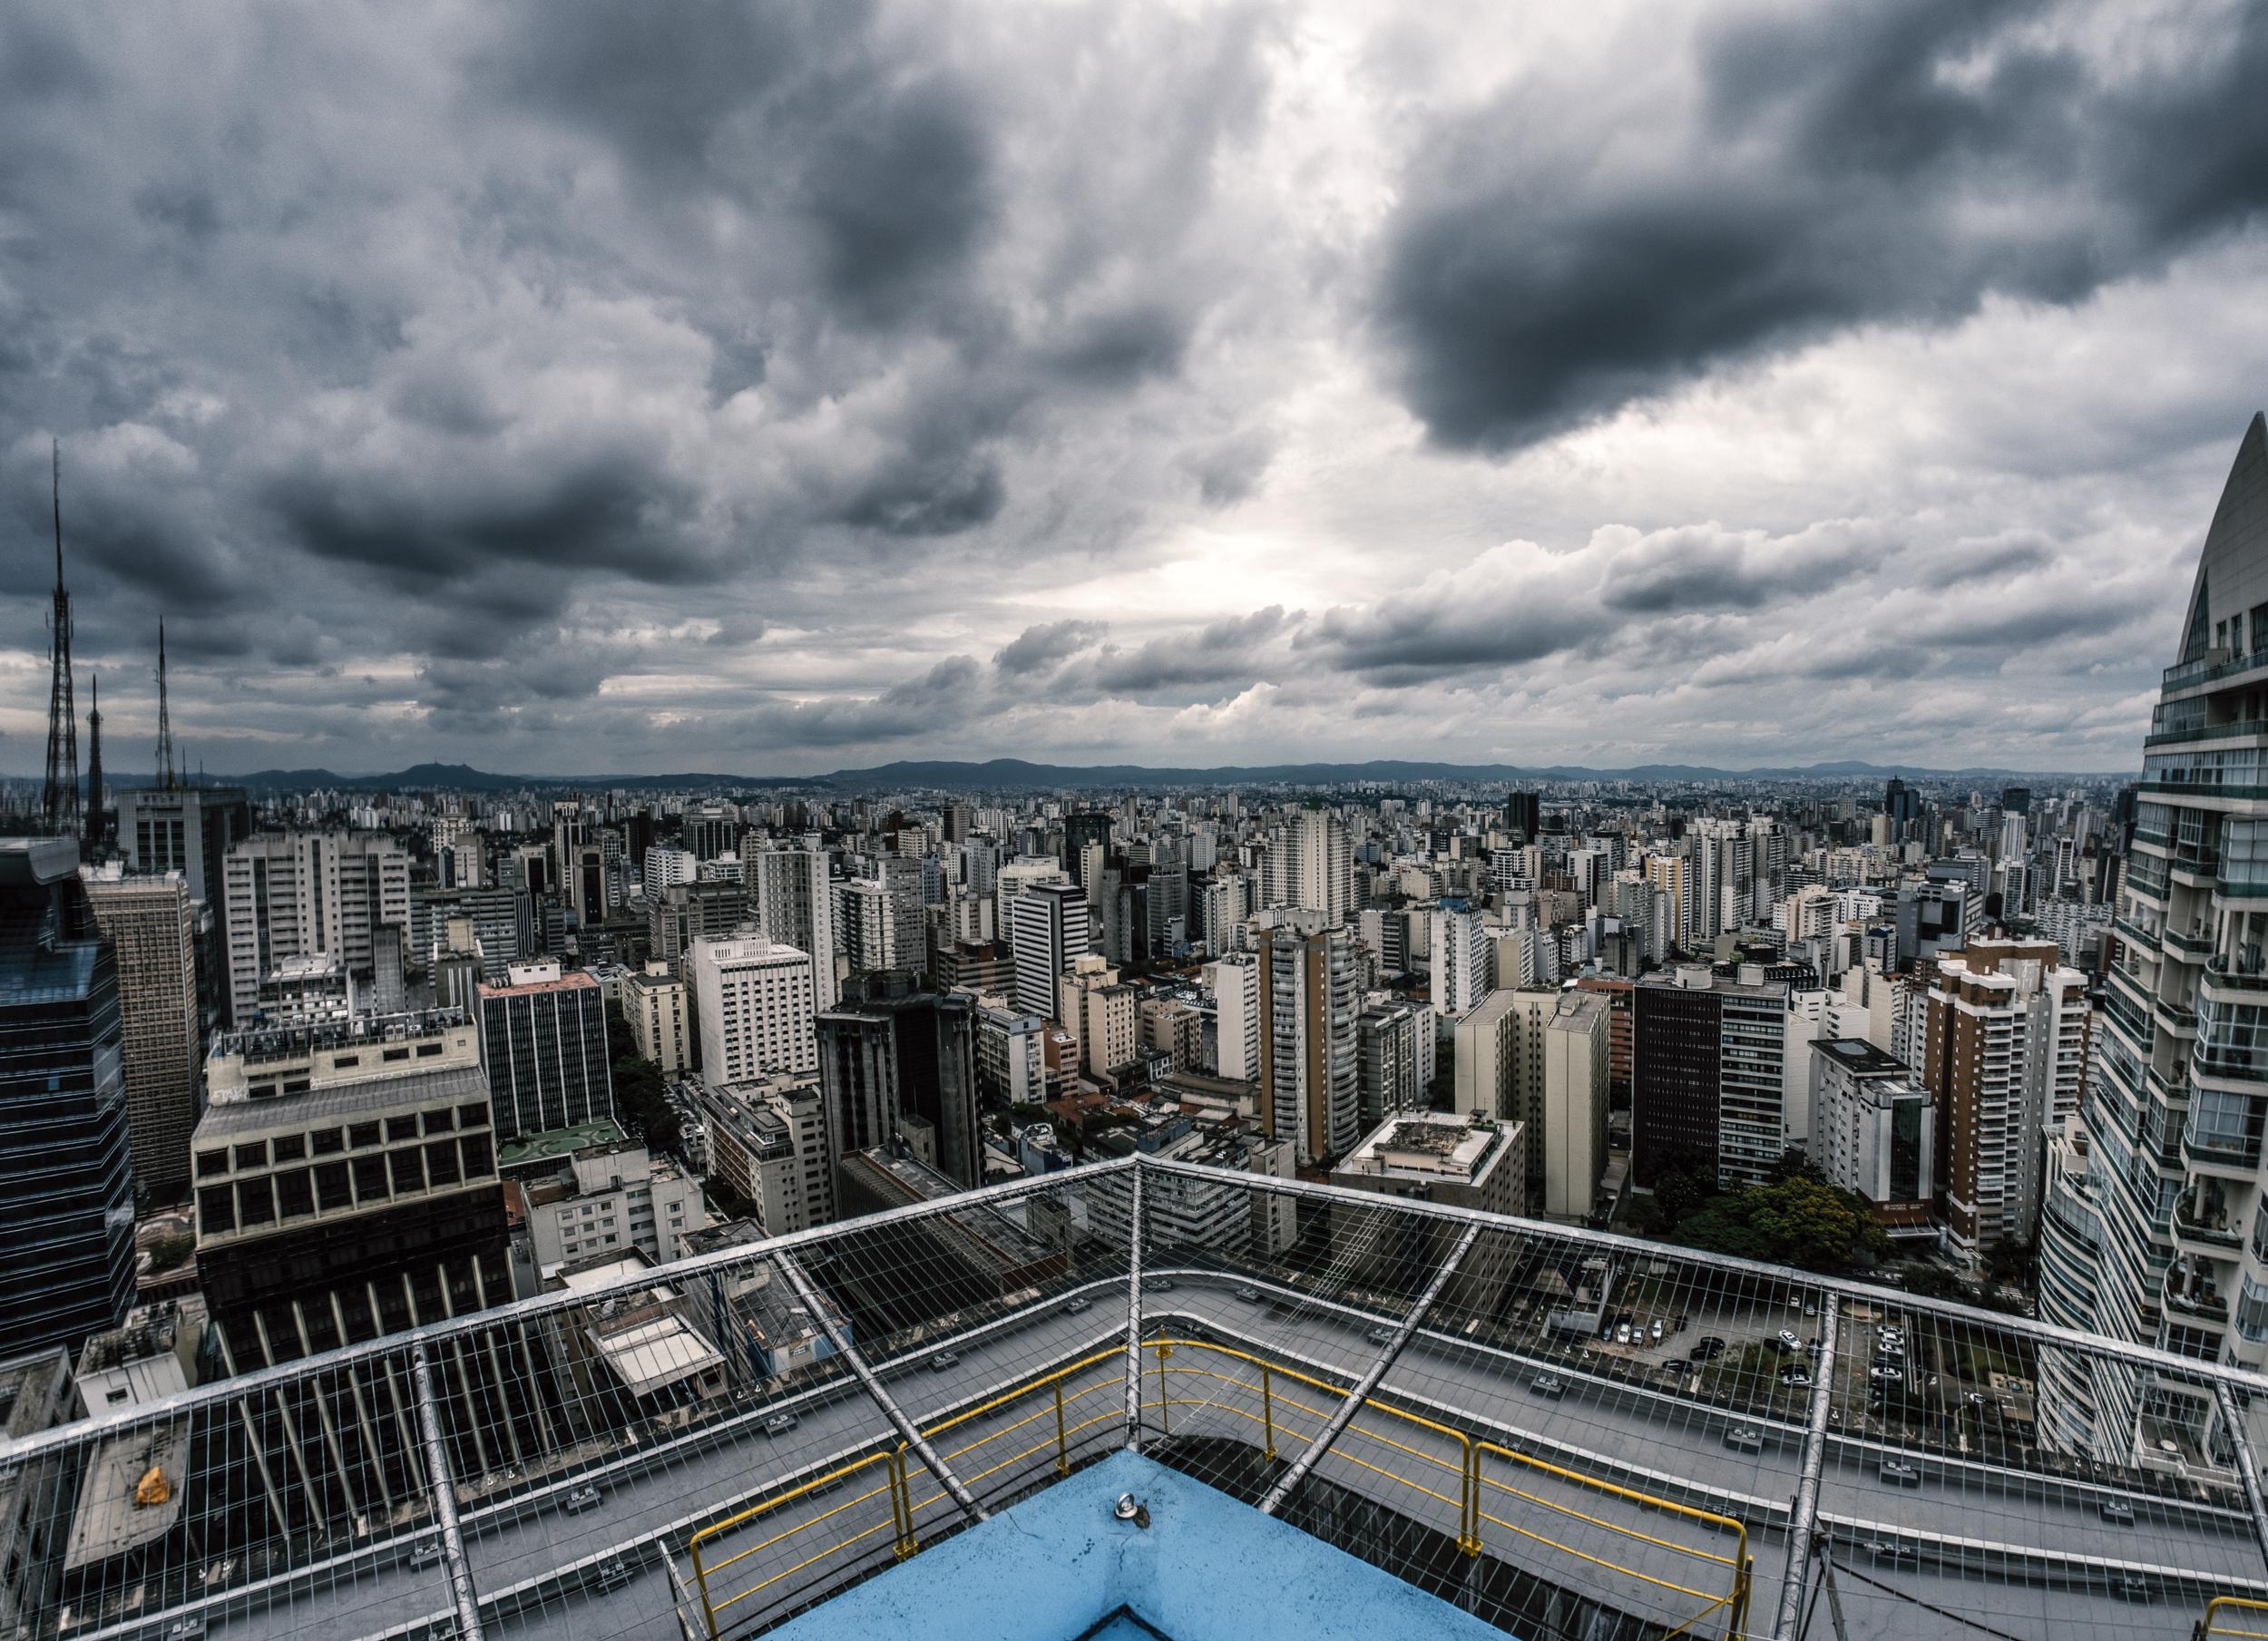 Charles_Brooks_Travel_Photography-58.jpg